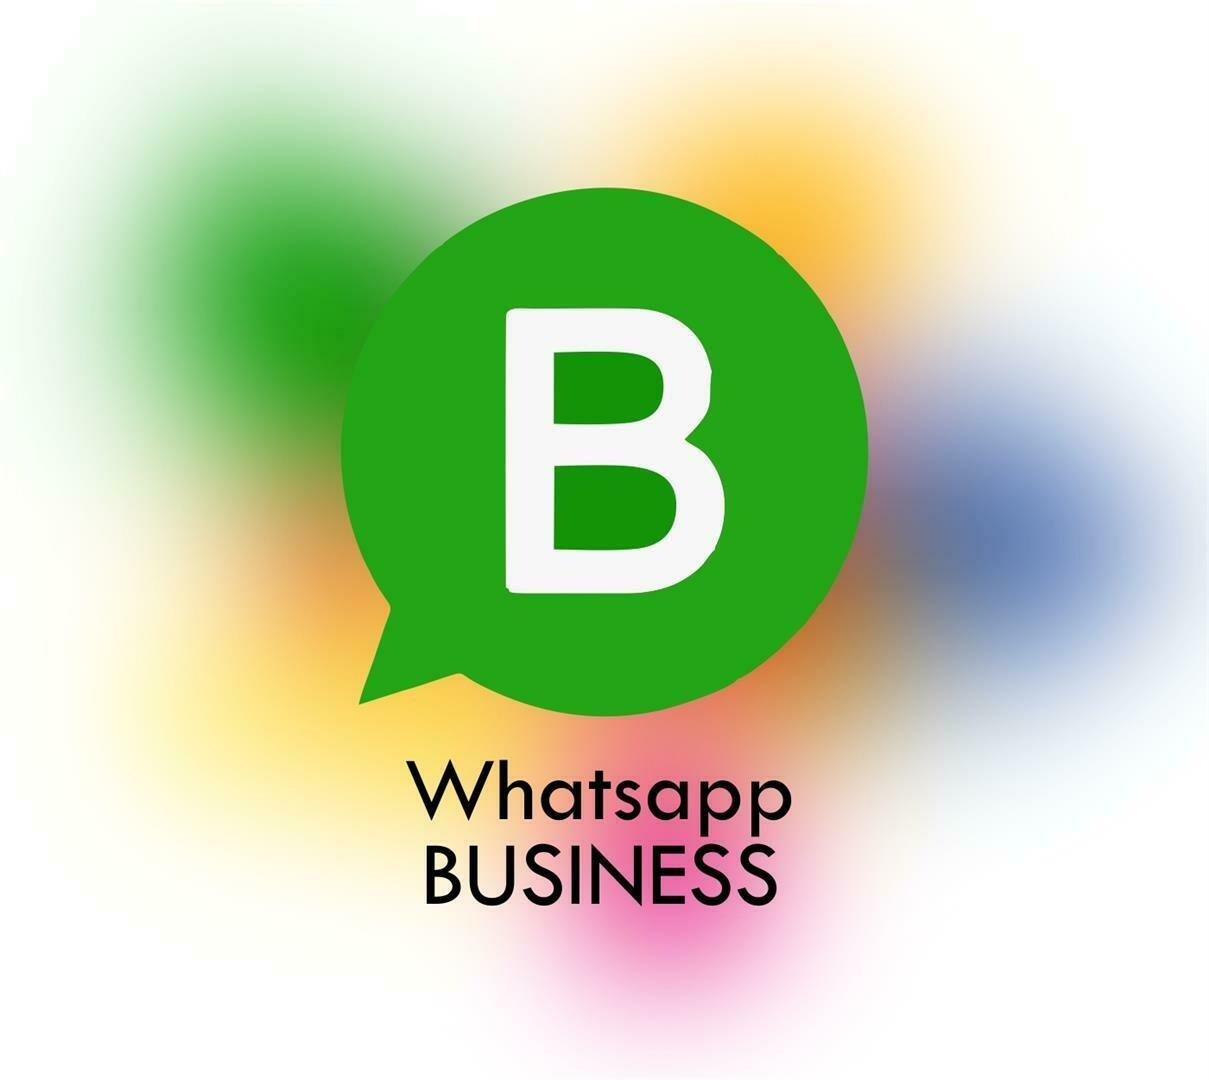 Whatsapp Business Page